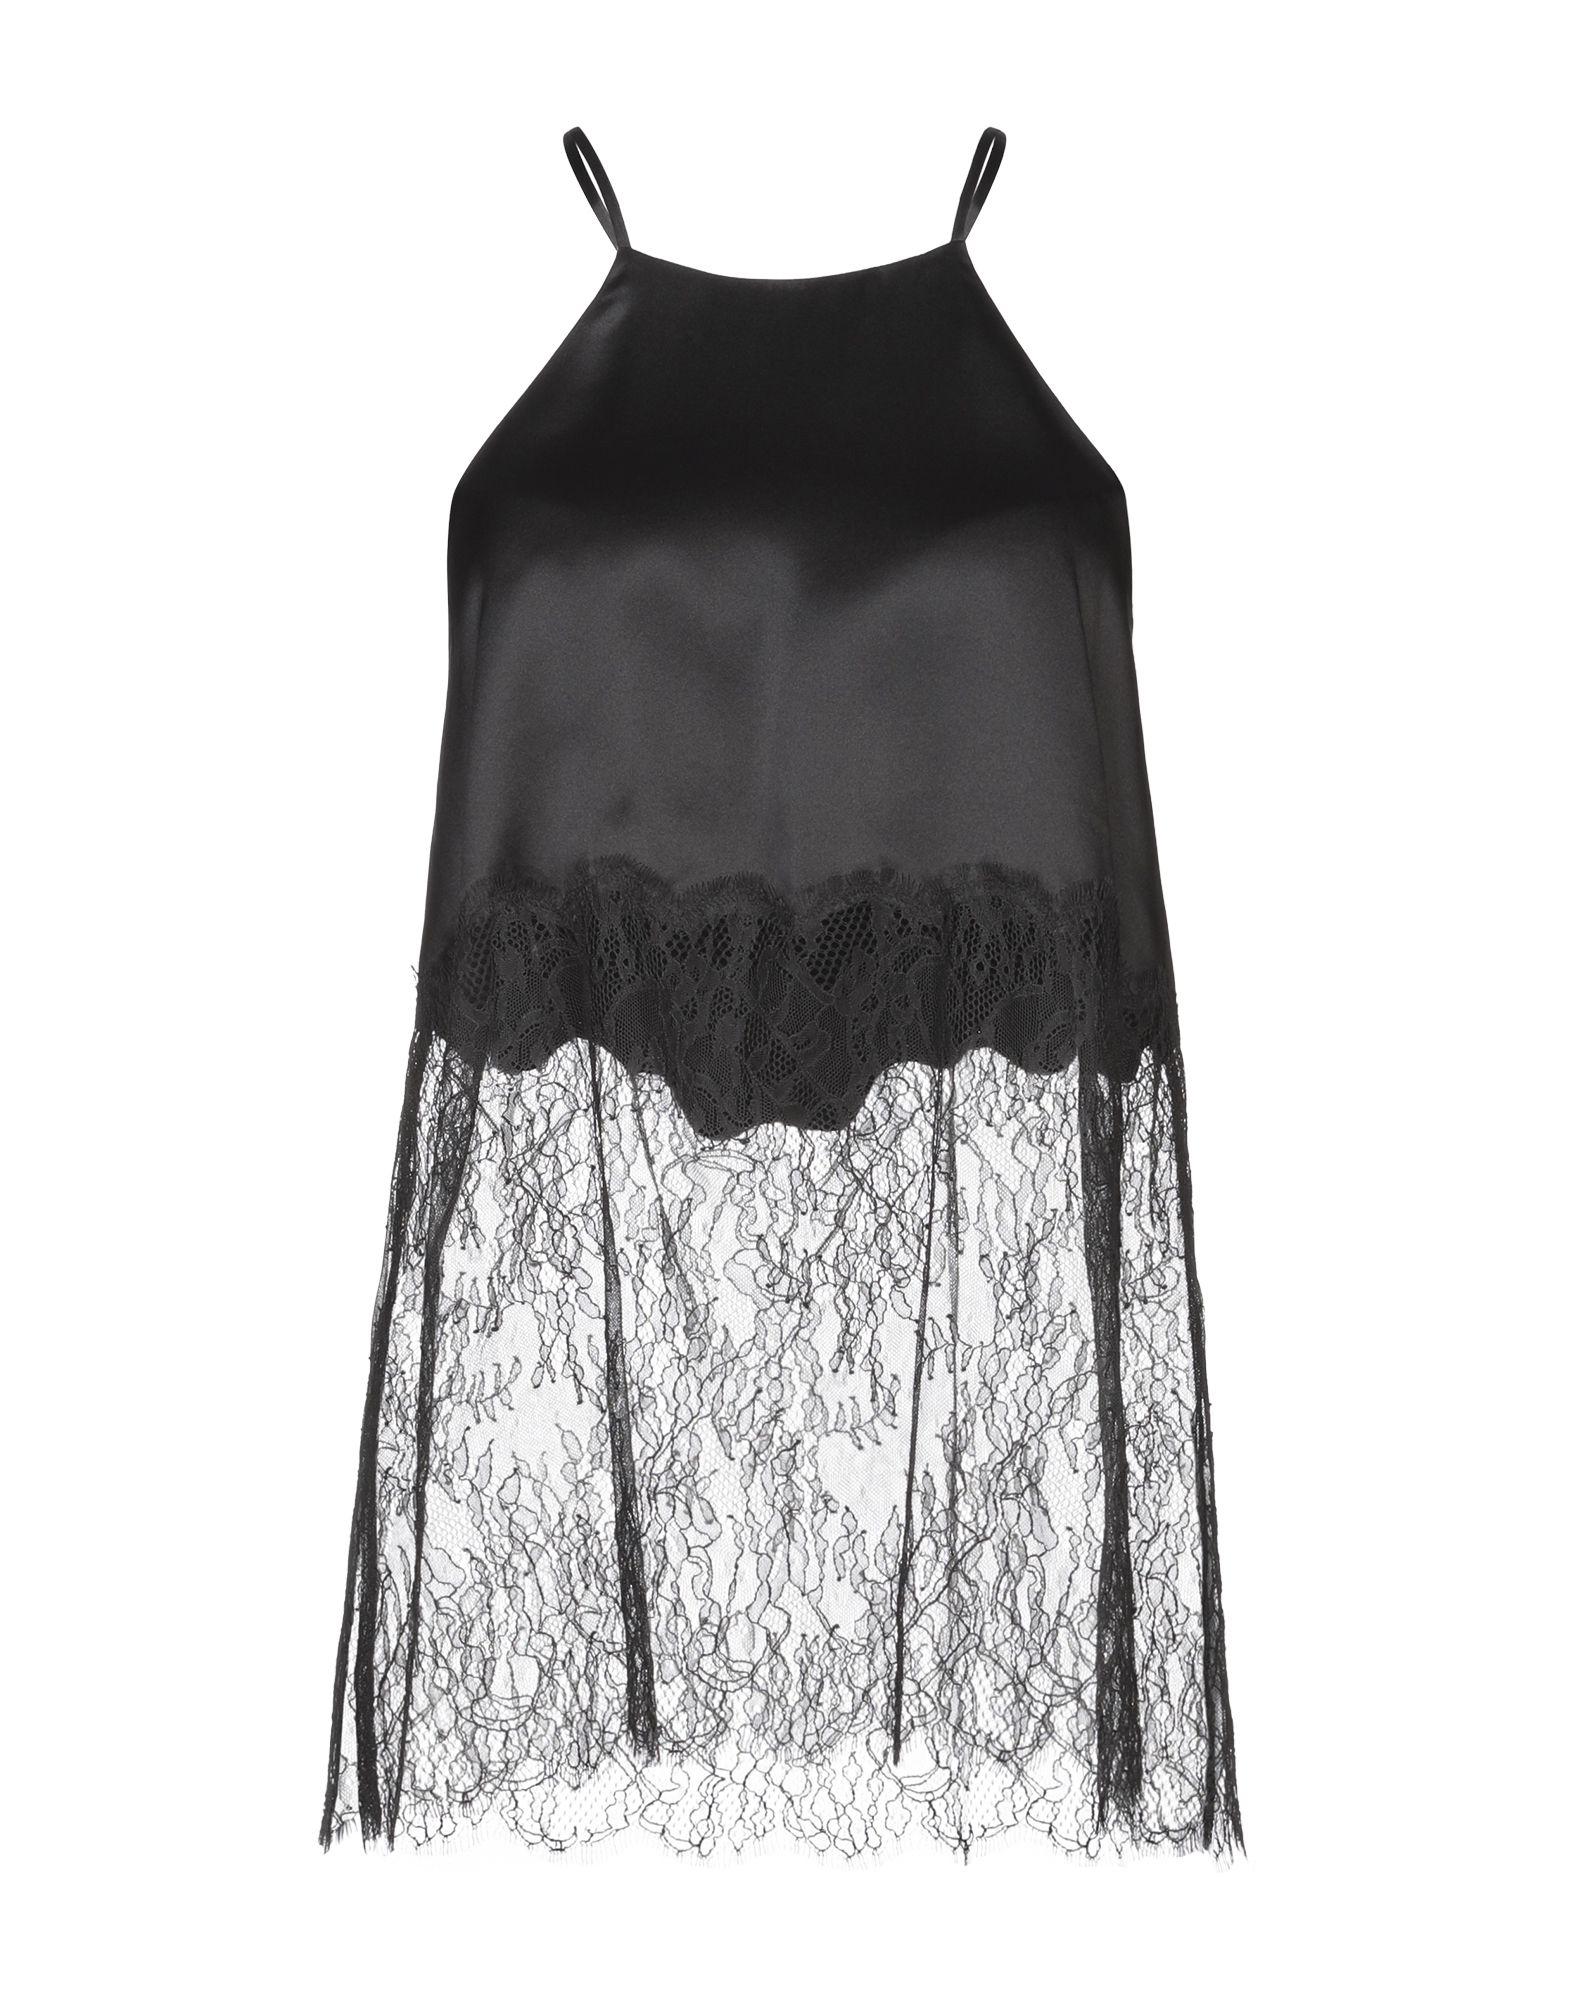 CAMI NYC Топ без рукавов brief low cut plaid print flounced women s cami dress